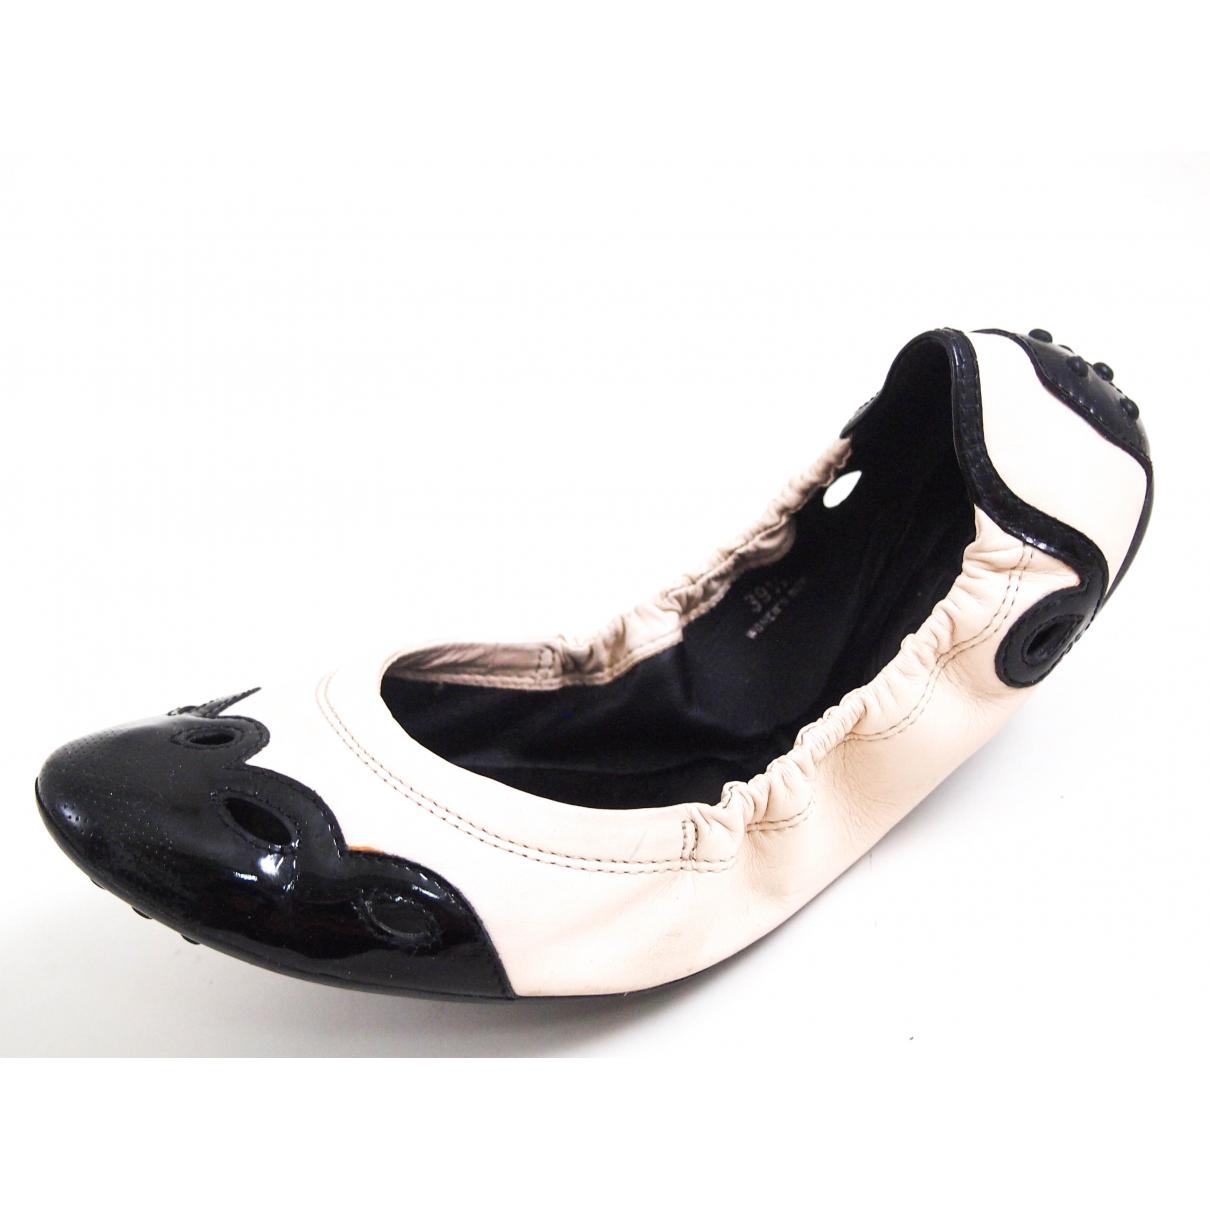 Tods \N Ballerinas in  Schwarz Lackleder